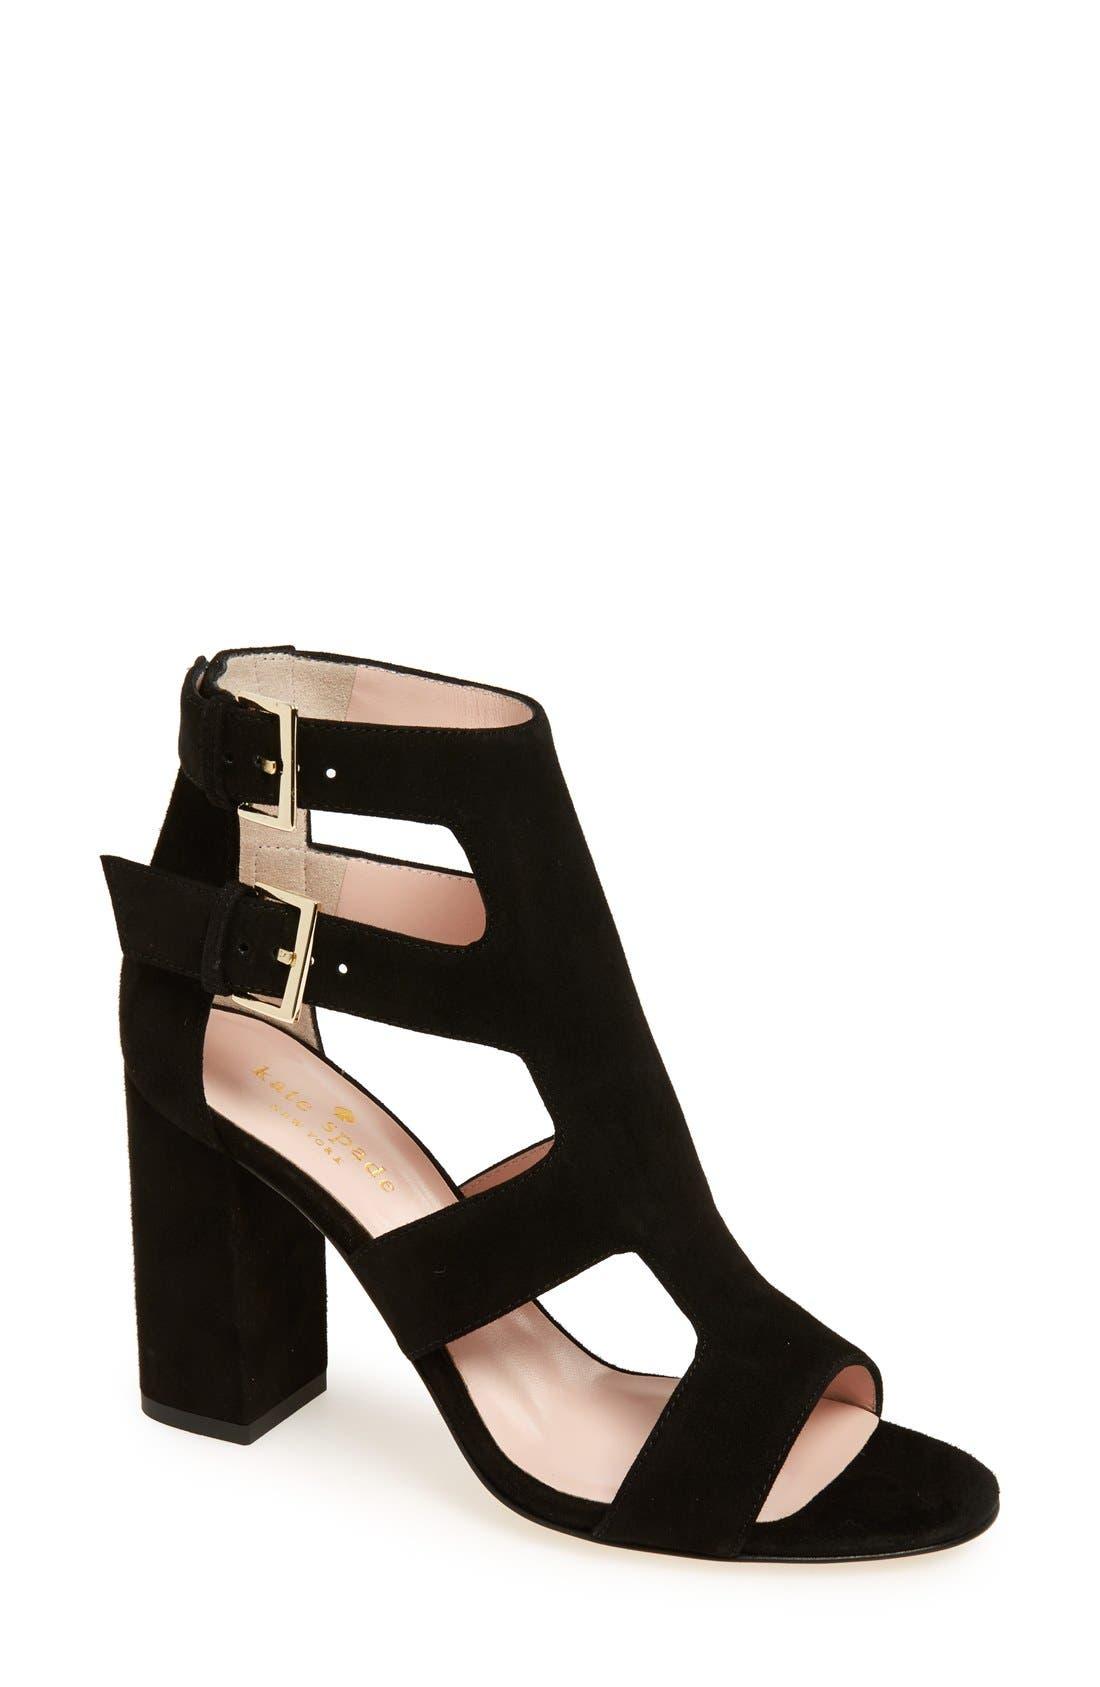 Alternate Image 1 Selected - kate spade new york 'ilemi' block heel sandal (Women)